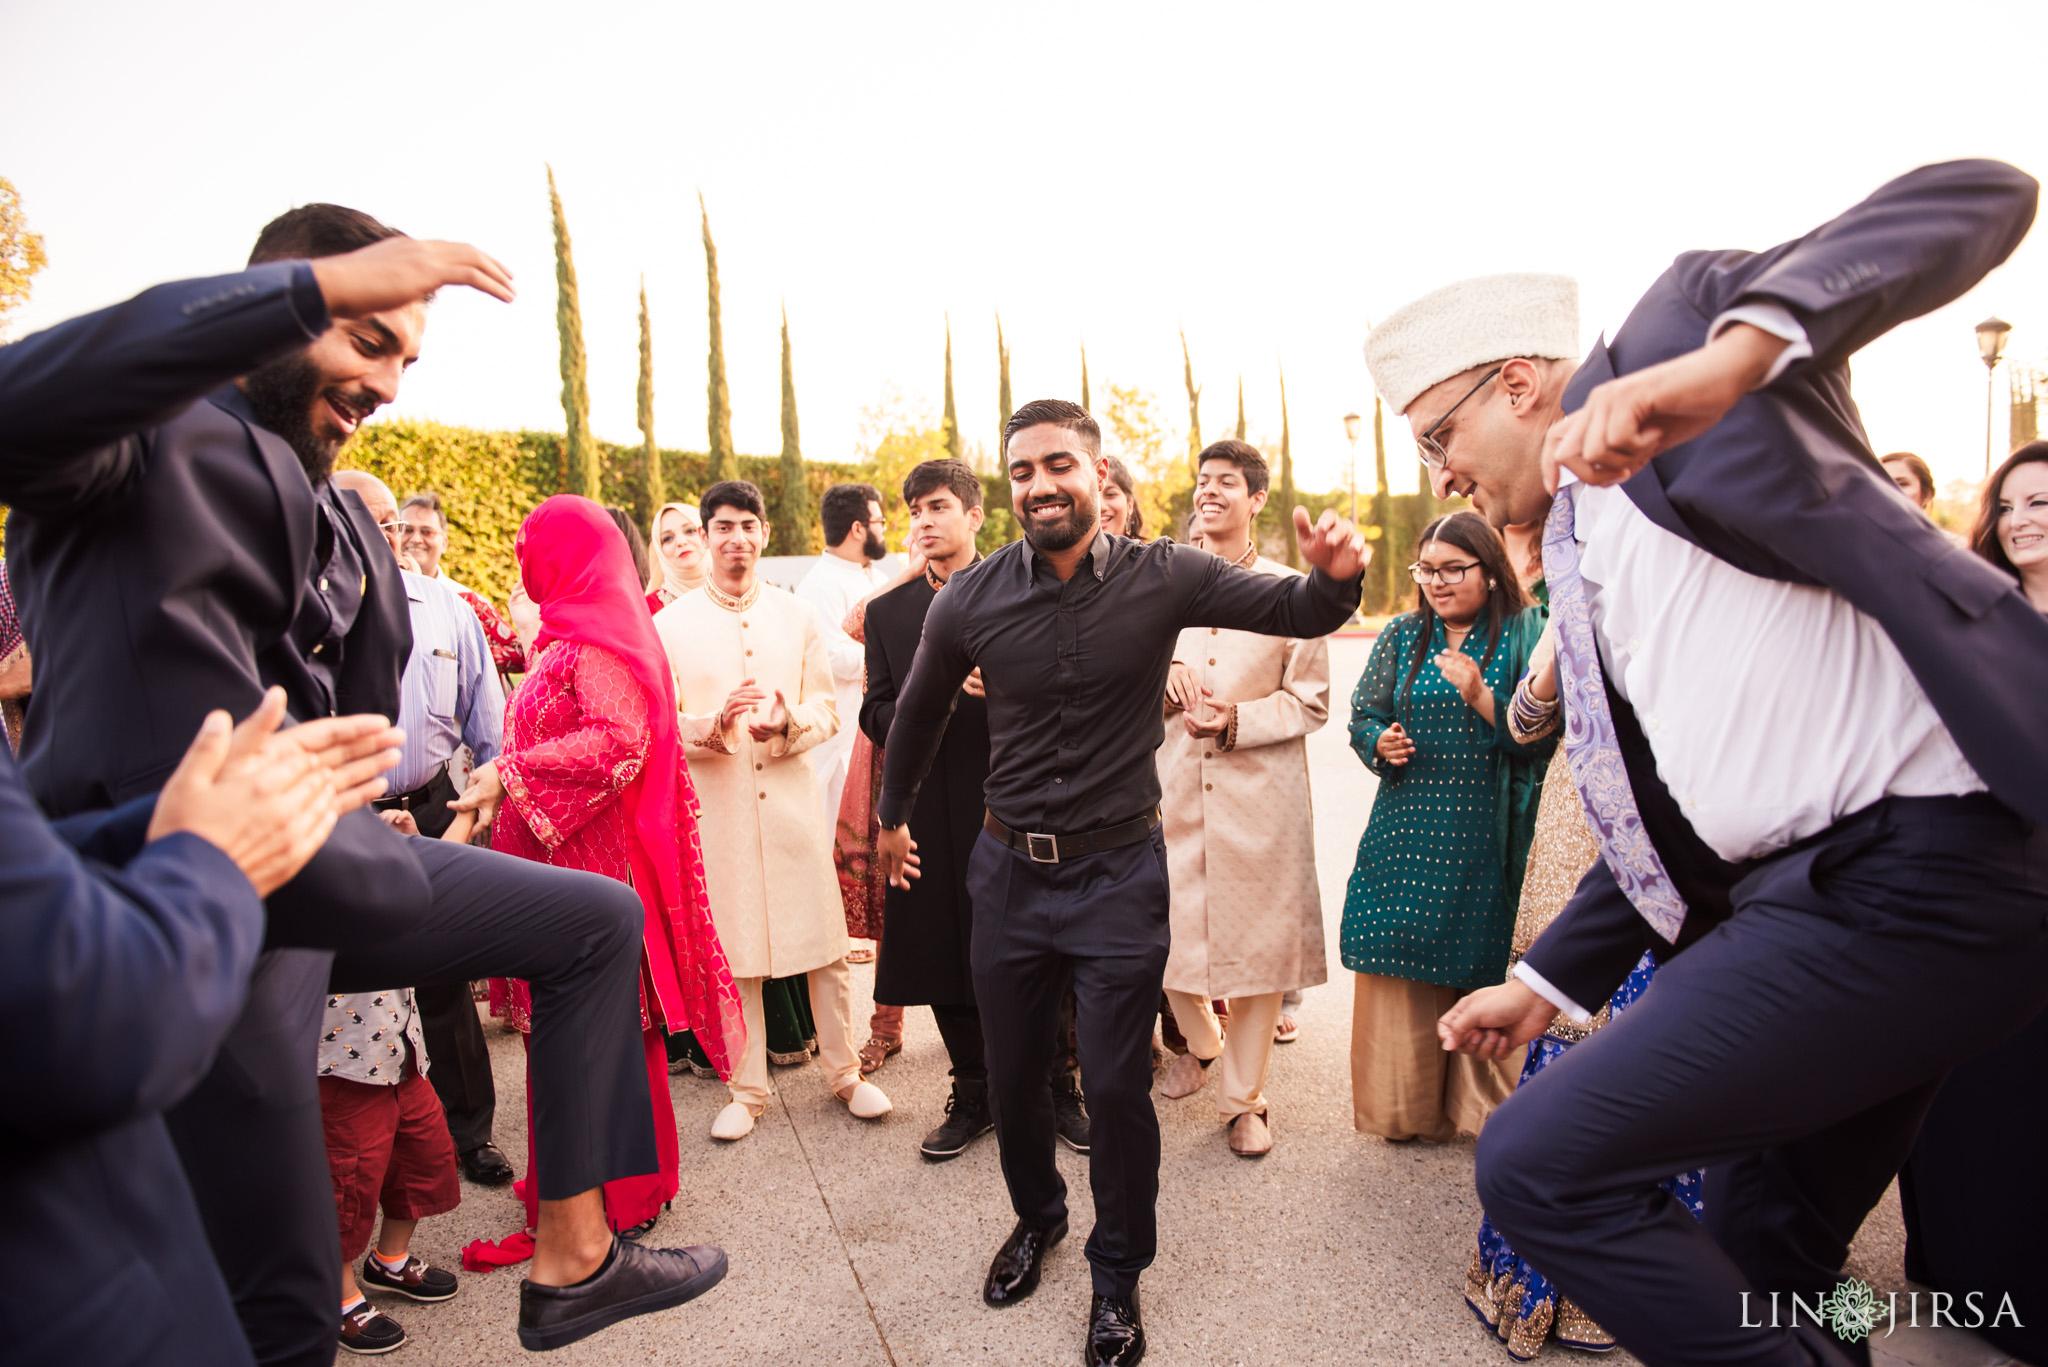 019 four seasons westlake village muslim wedding photography